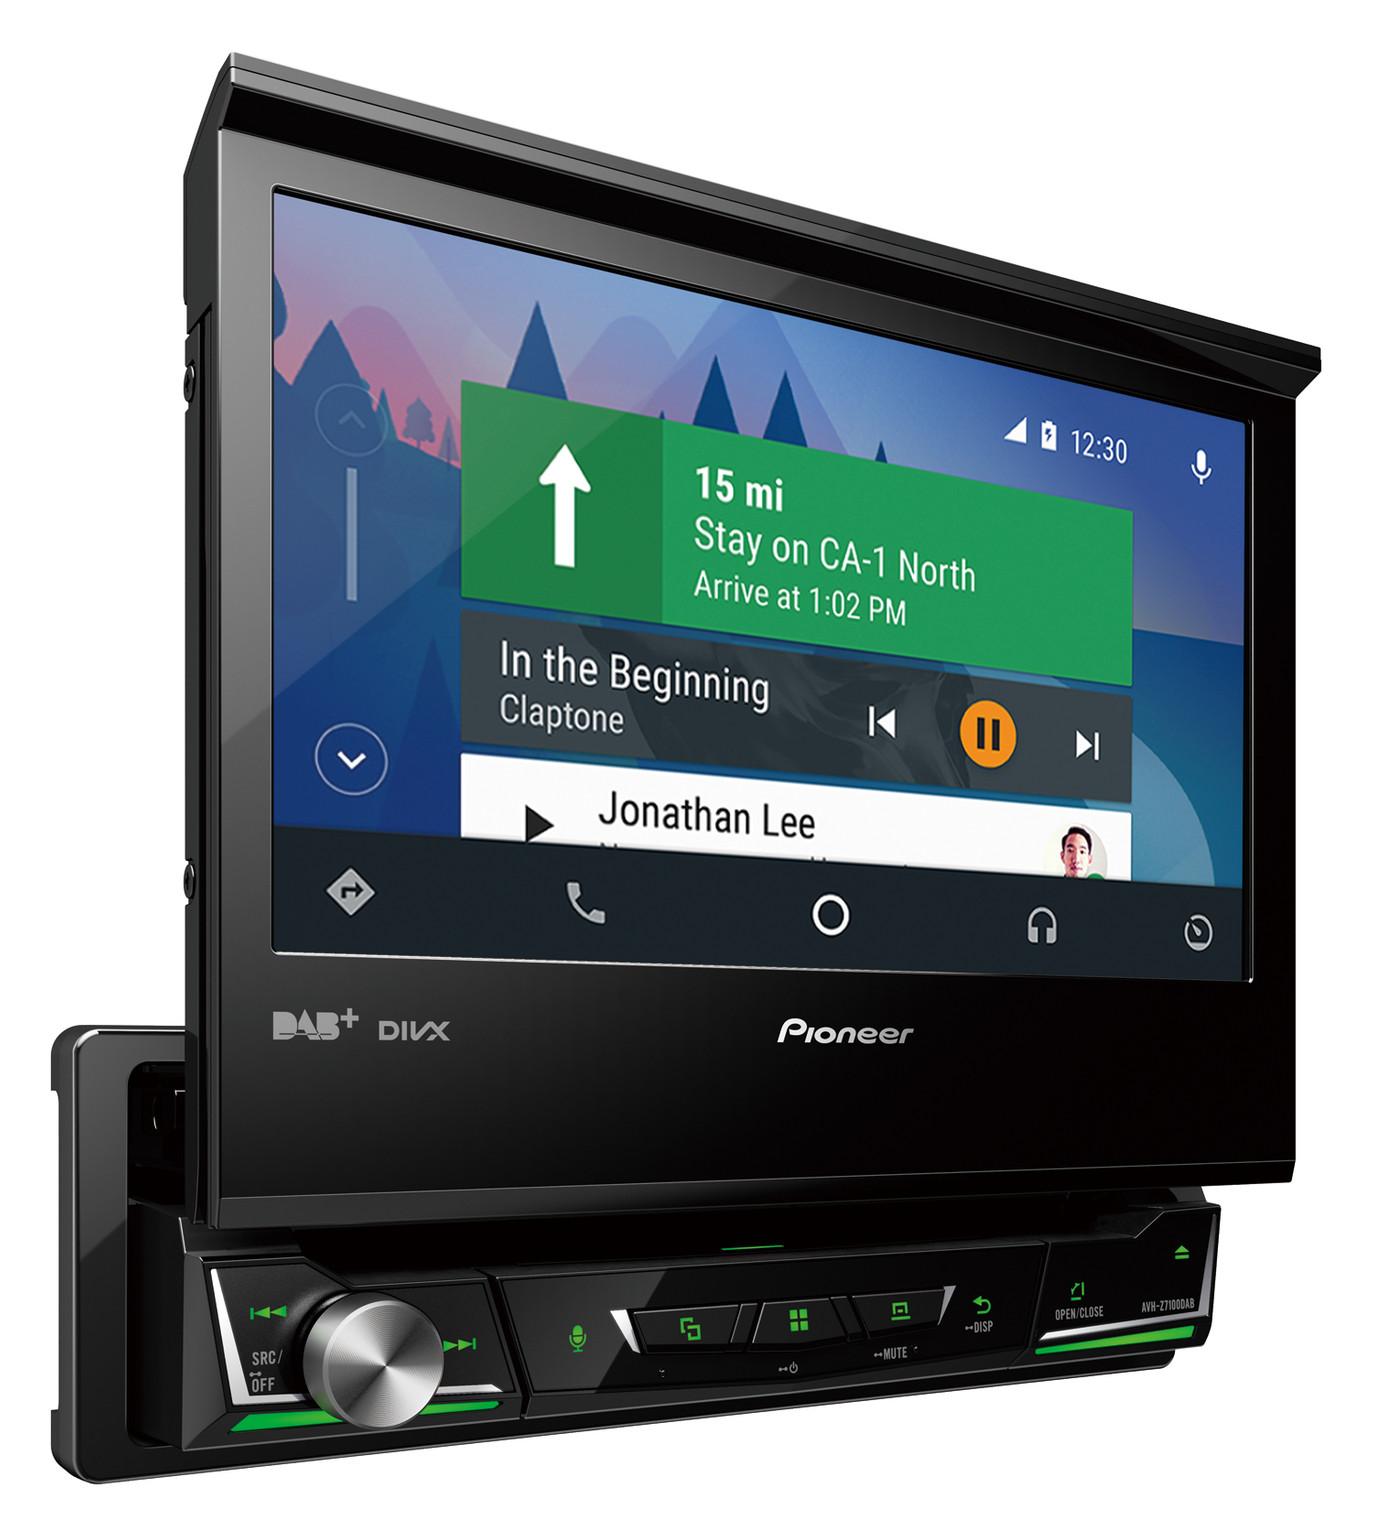 1Din Android Autoradio gevonden op CoolBlue | Huisvanvandaag.nl